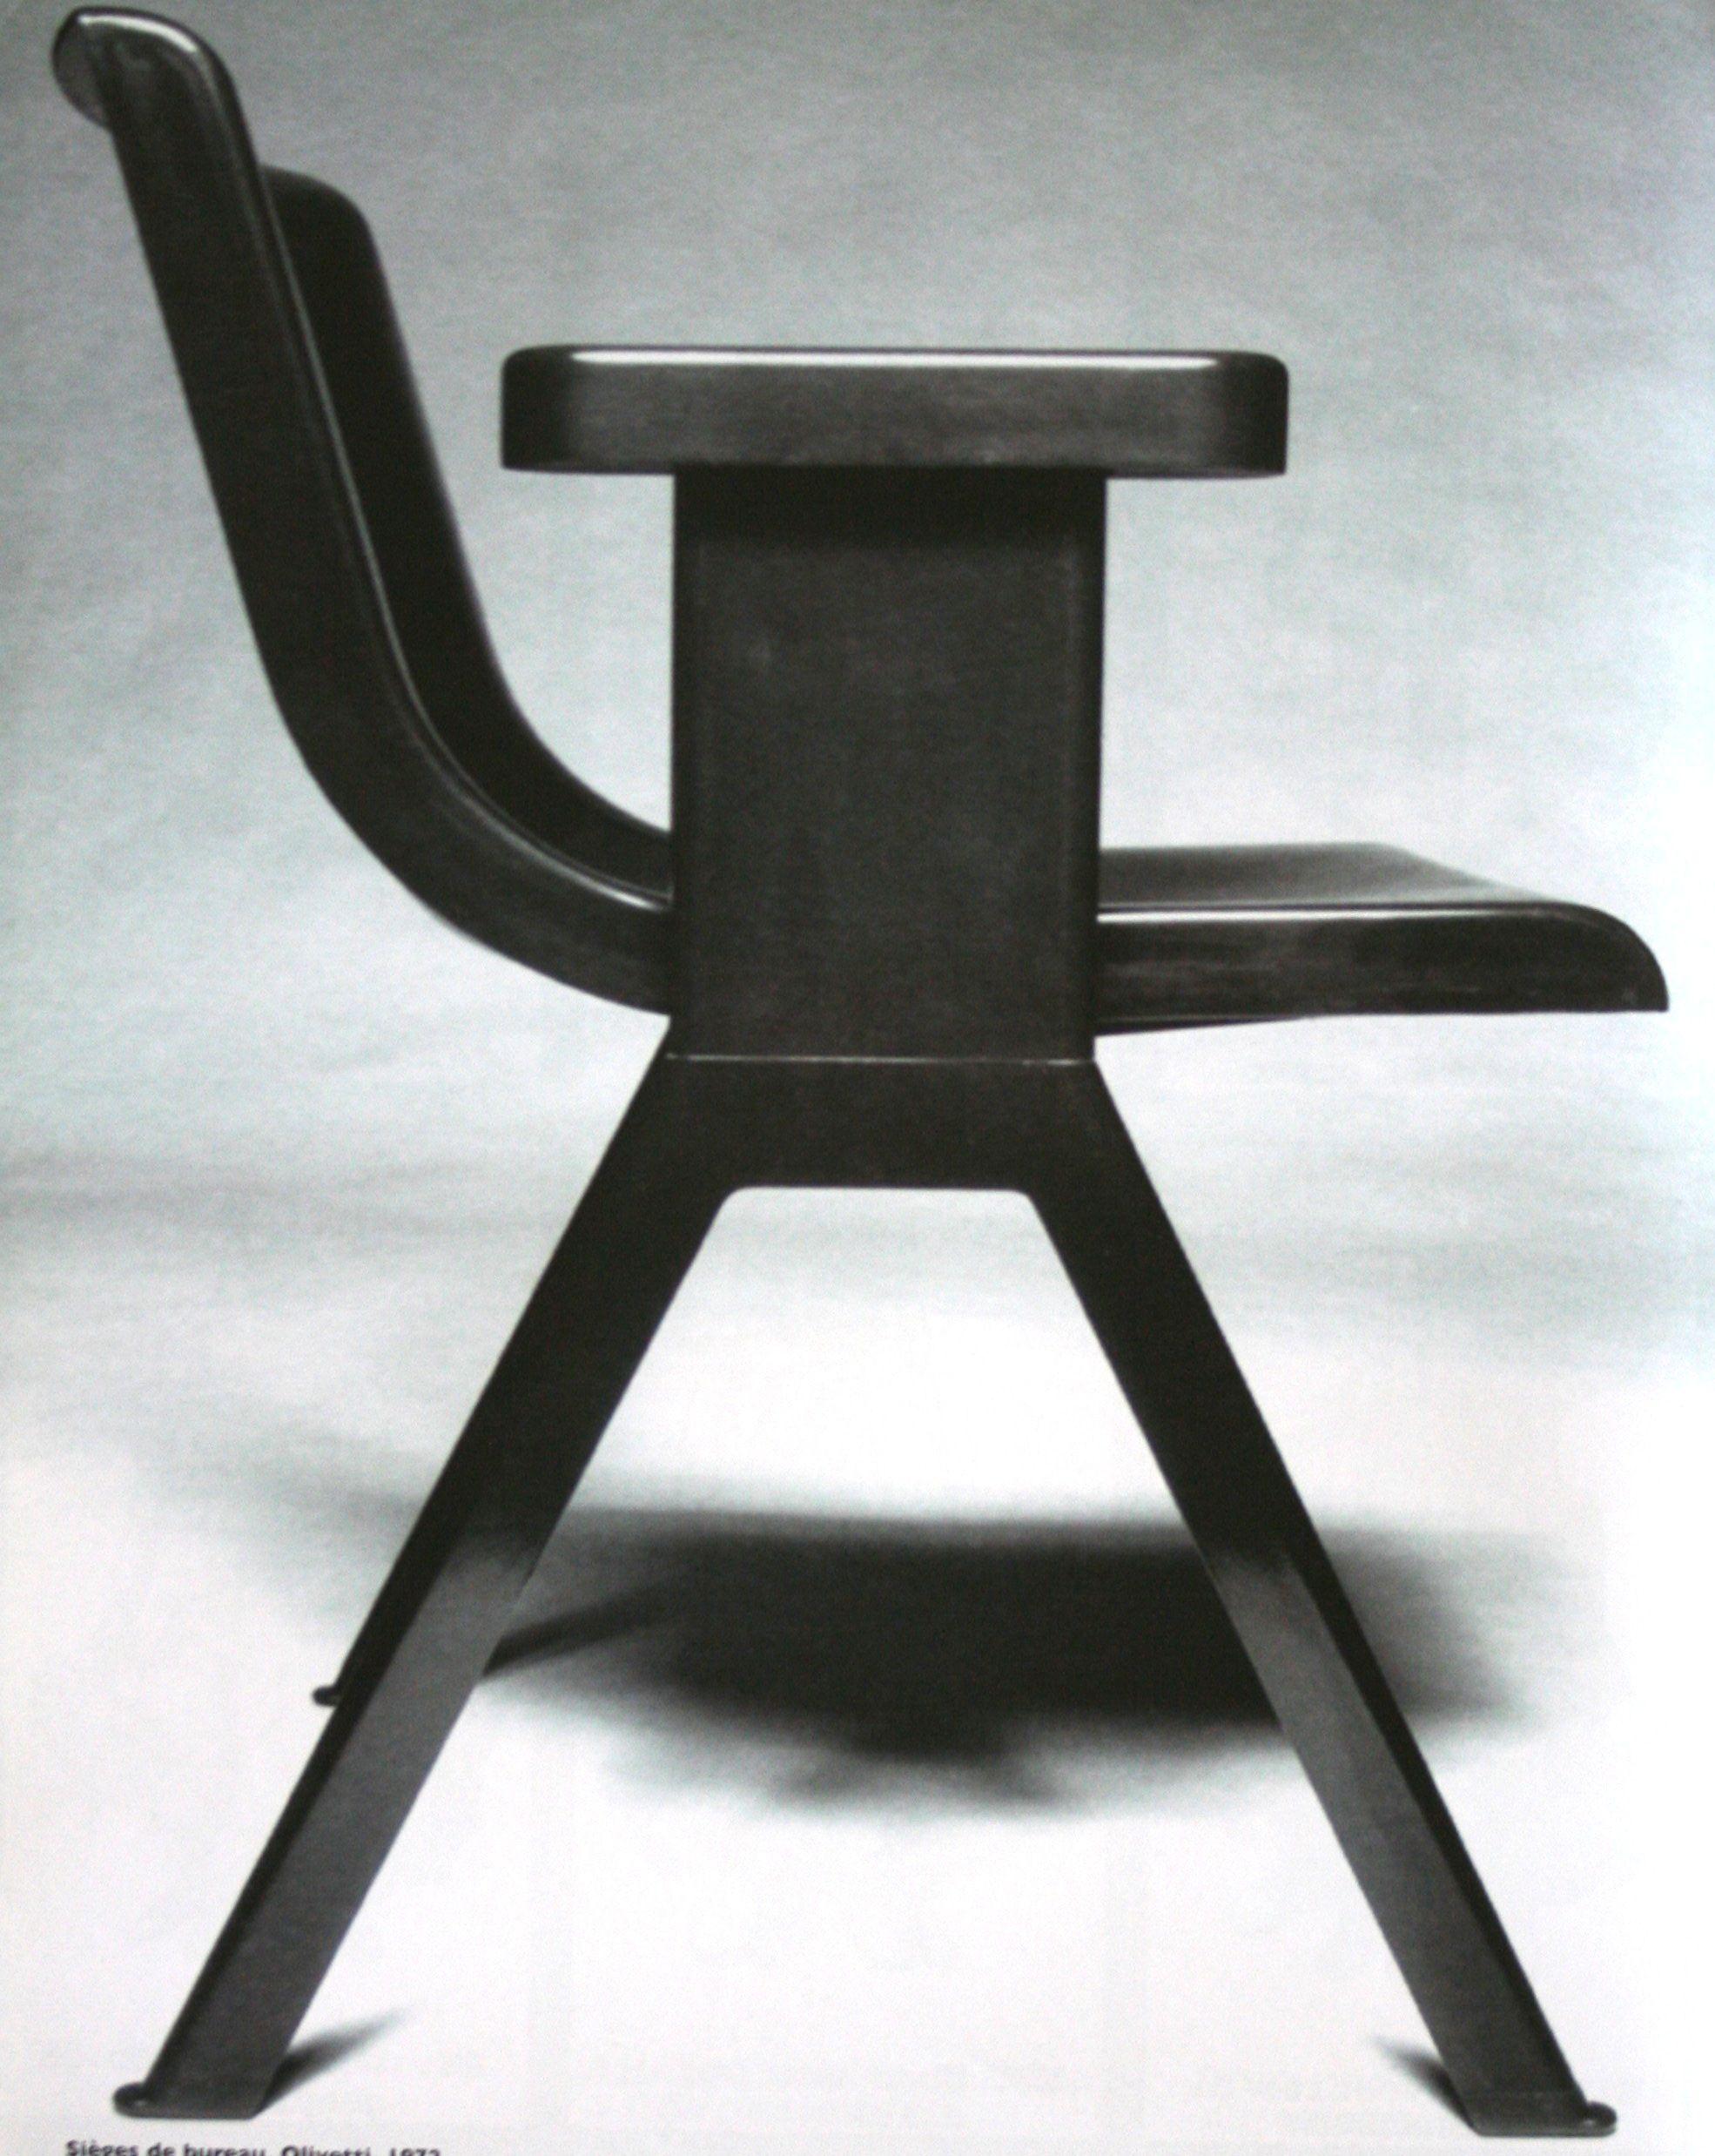 Ettore Sottsass Italian Architect Designerlove the chair